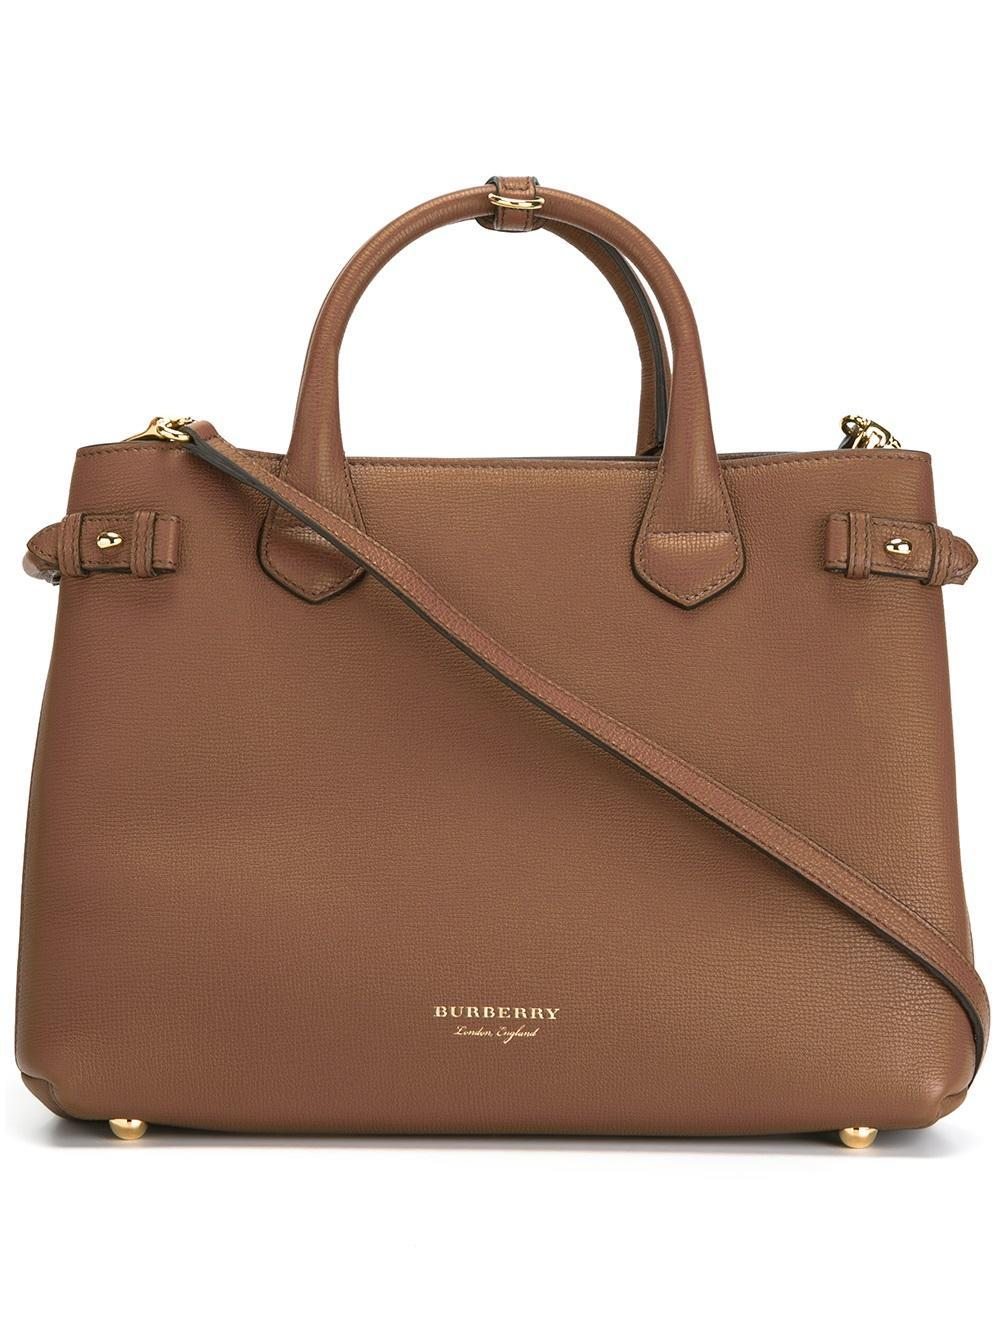 Burberry Medium  banner  Handbag in Brown - Lyst c19b60b31a0f7